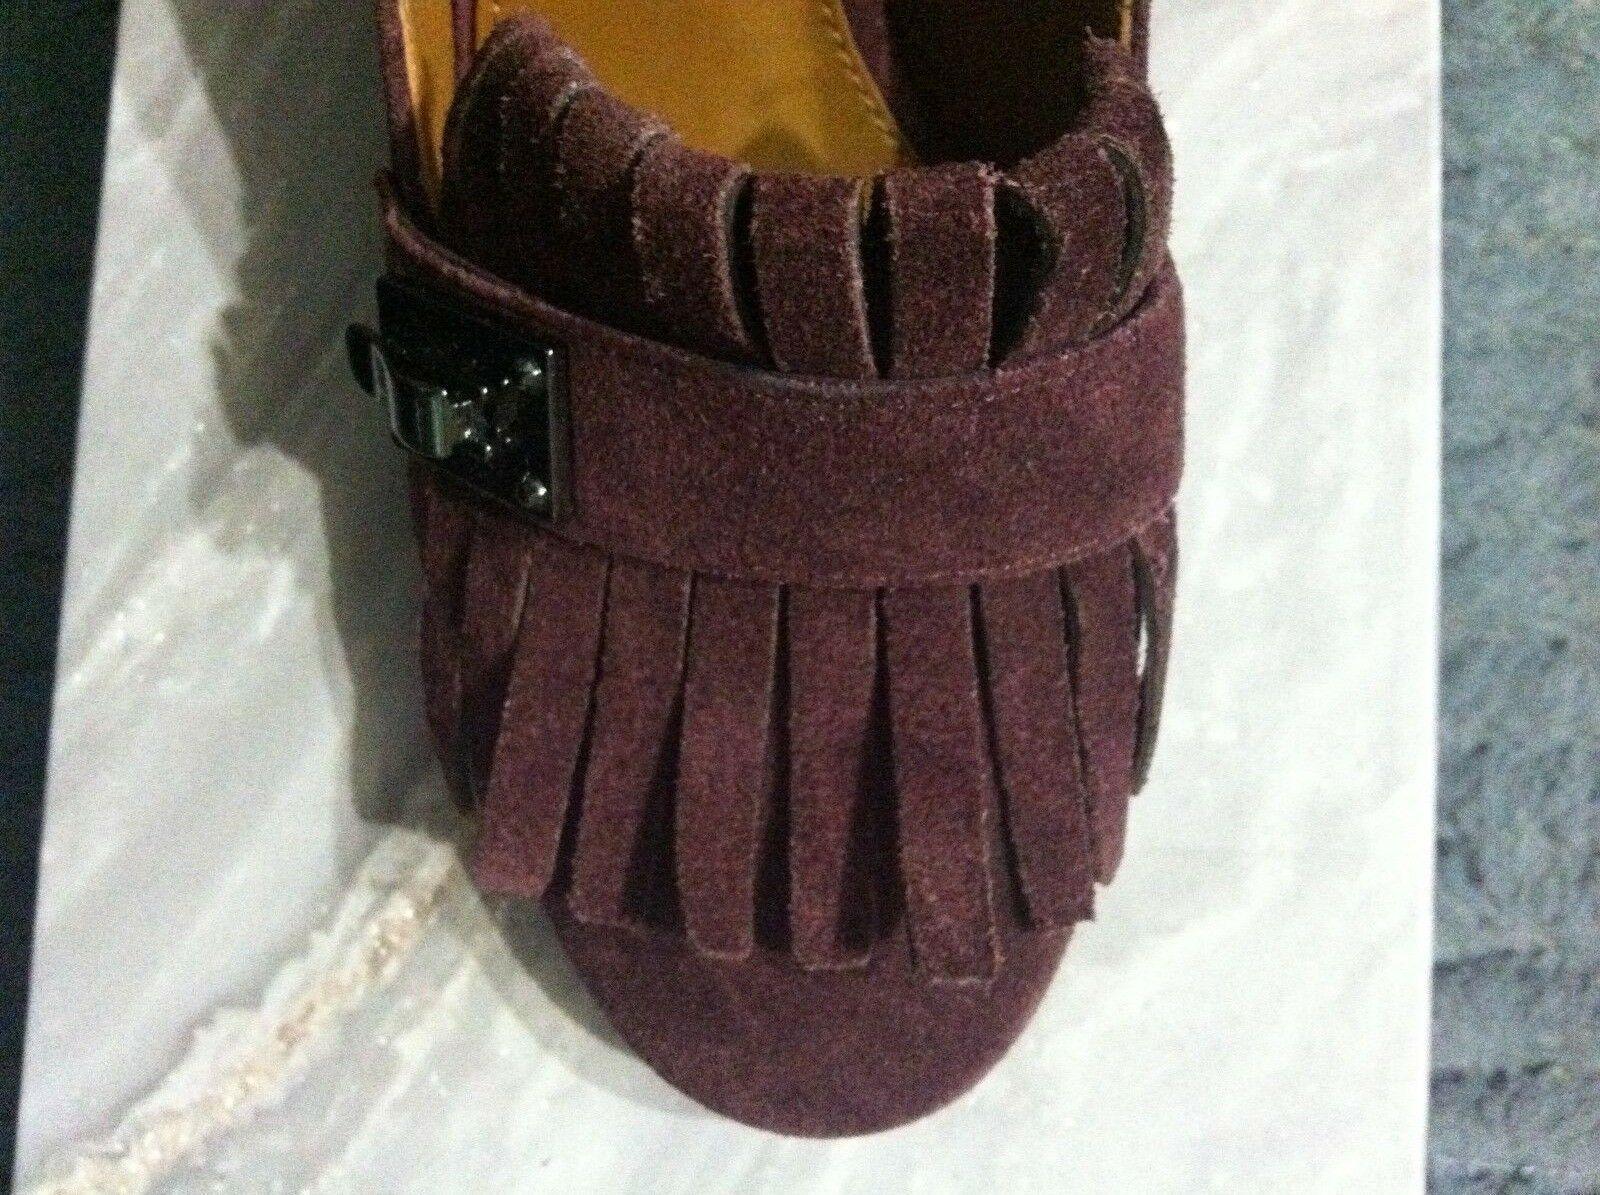 Franco Sarto Damen Neu Burgunder Leder/Wildleder Oberseite Anzug Schuhe Größe:6 image 4